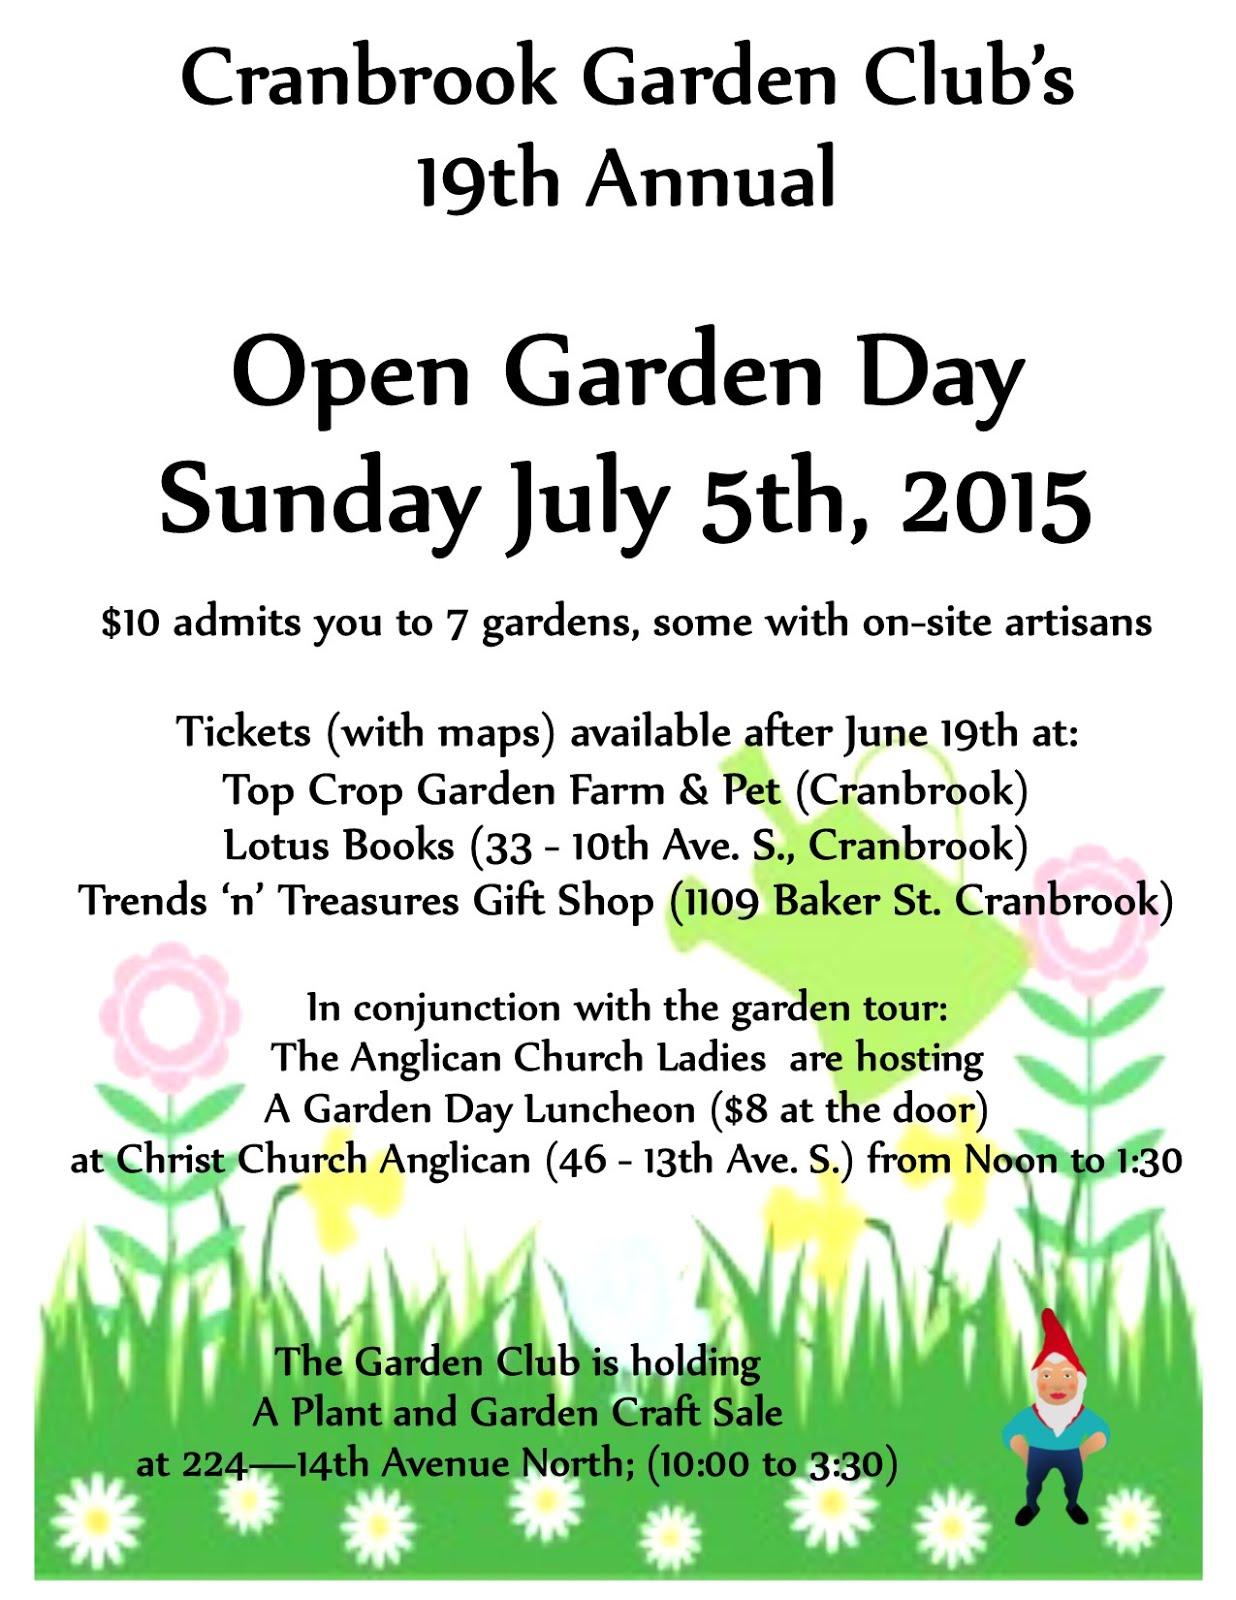 Open Garden Day